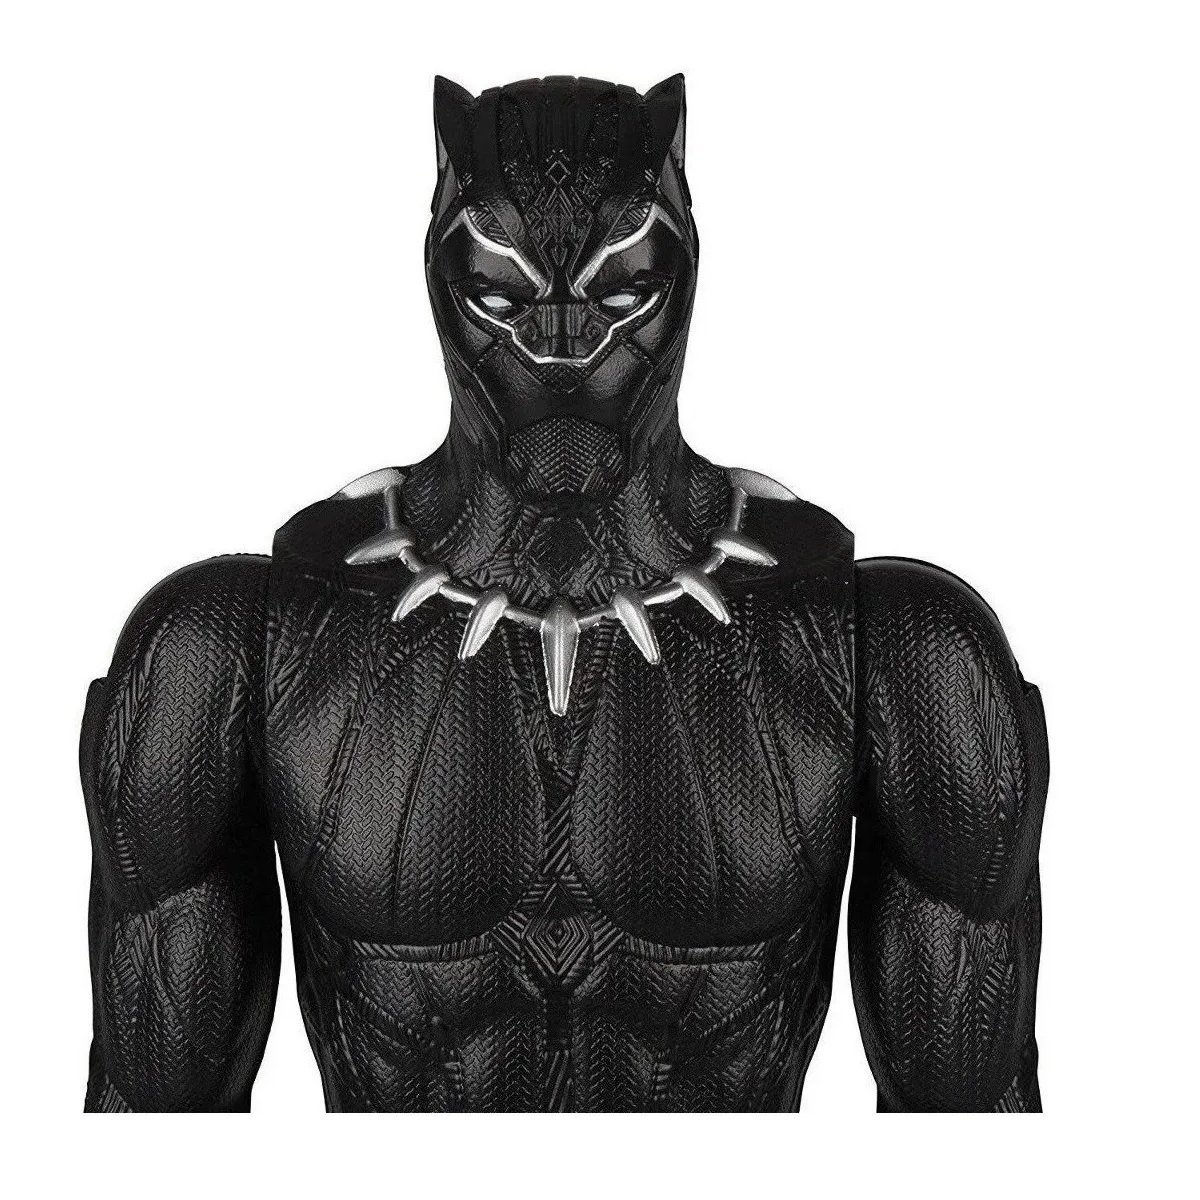 Boneco Pantera Negra Comics Articulado 50 Cm - Mimo 0554